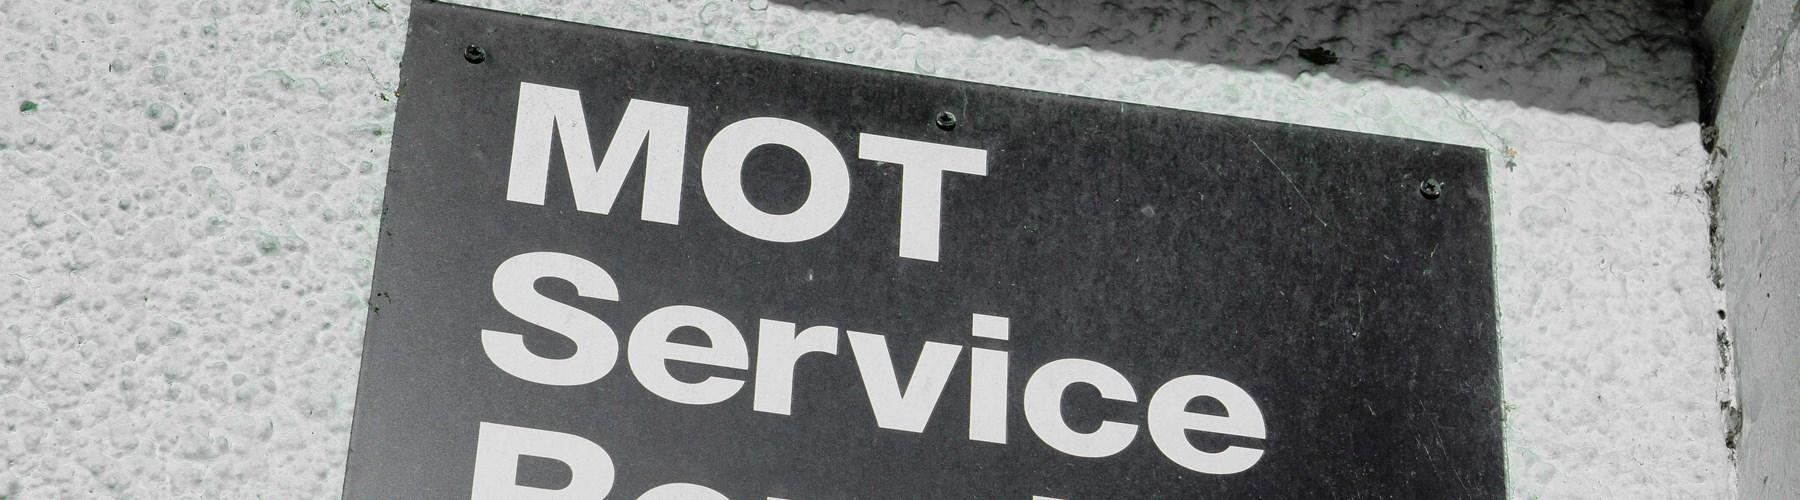 MOT service repair sign